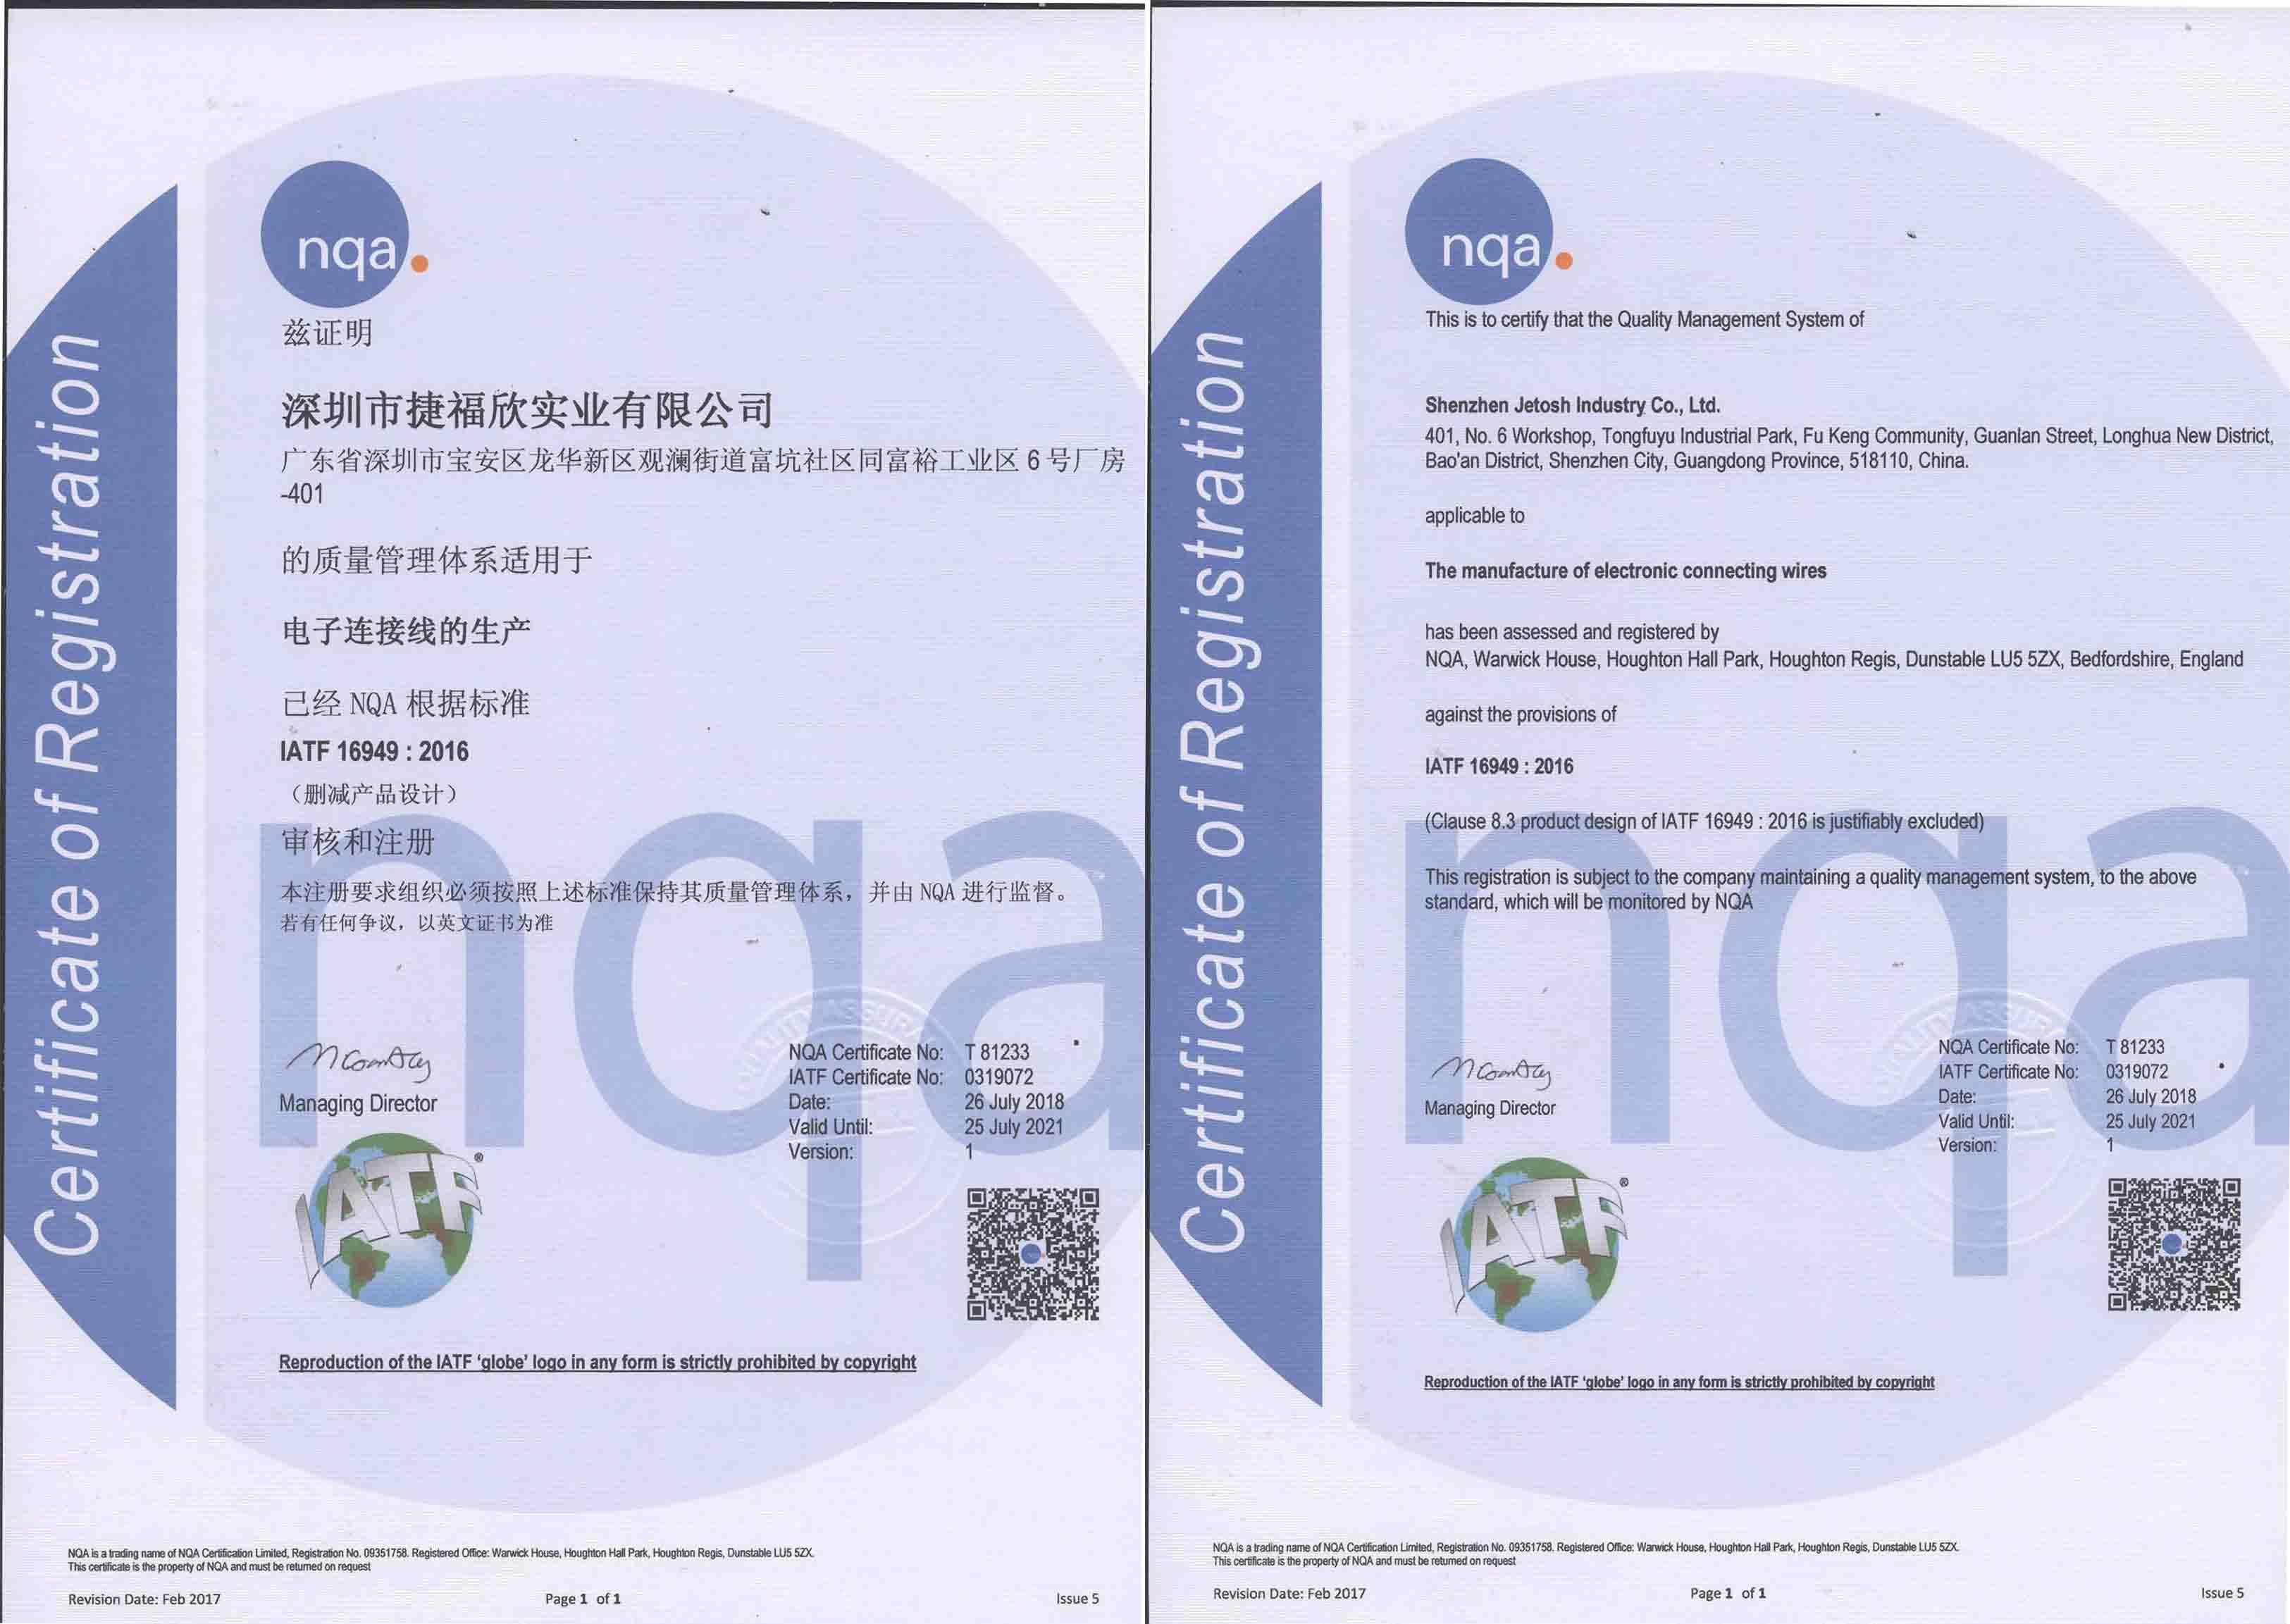 JETOSH Certificates: Quality Association member units